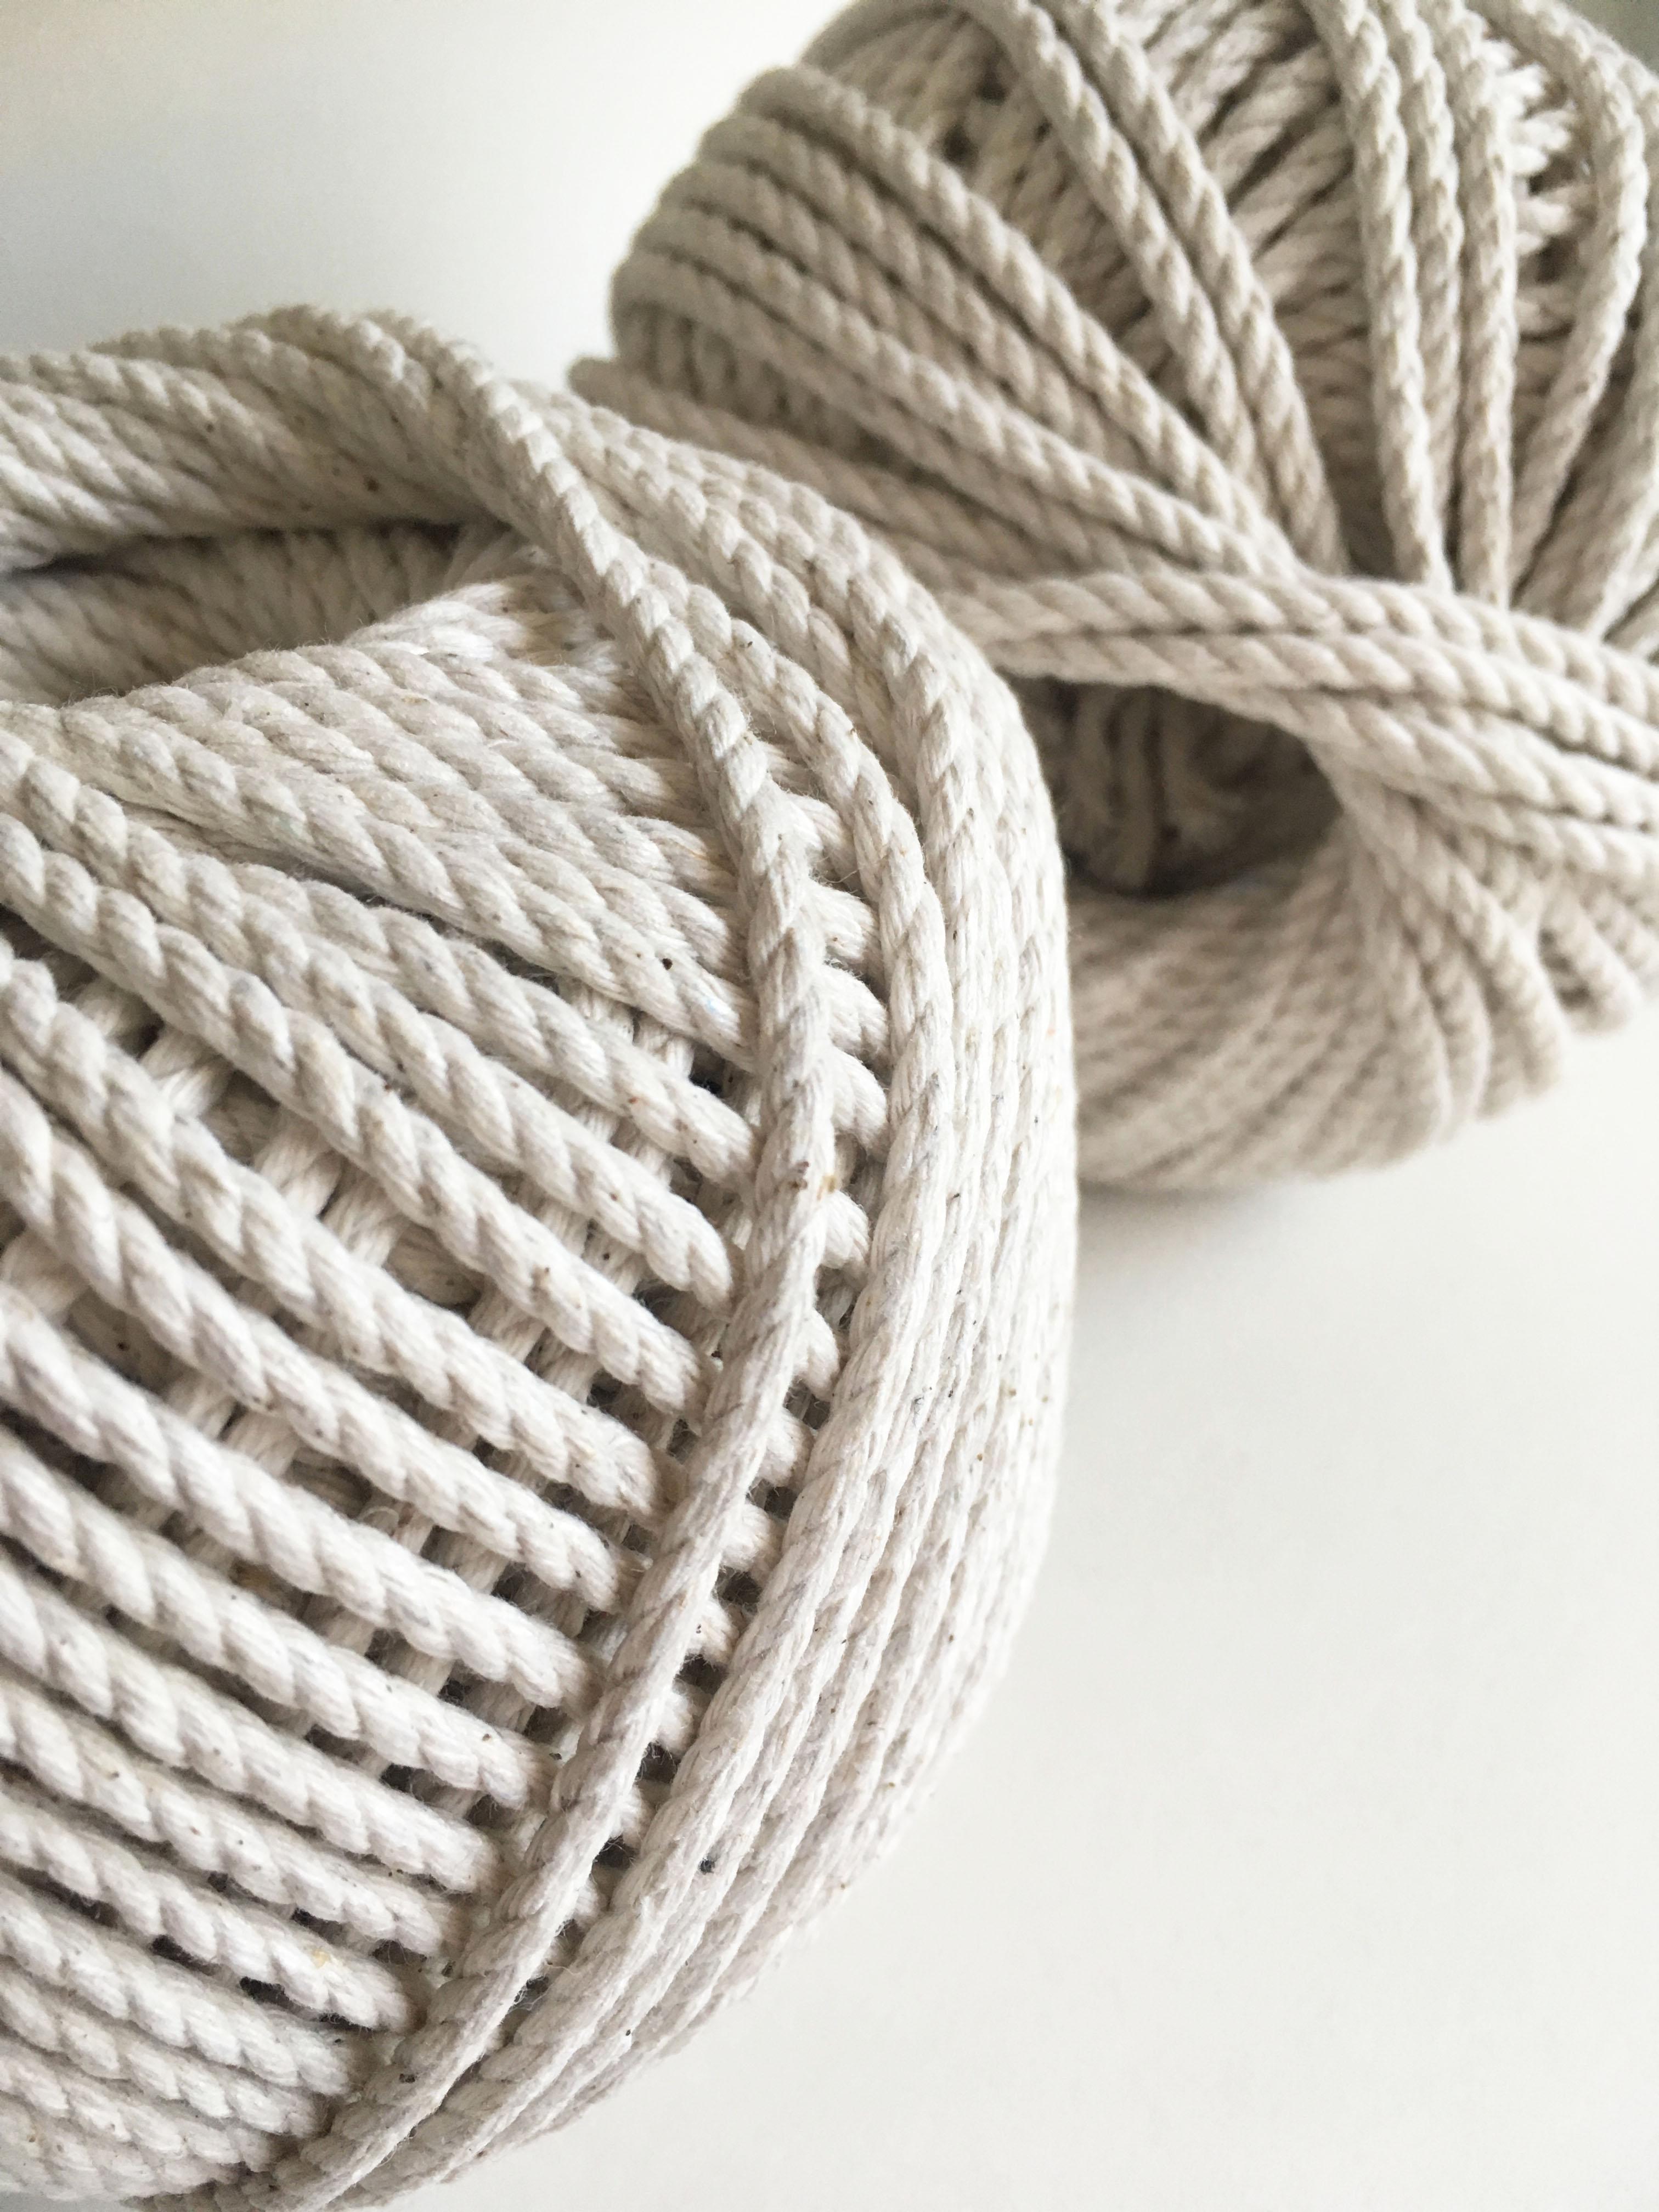 3ply macrame rope fiber art cord 100 cotton rmc. Black Bedroom Furniture Sets. Home Design Ideas